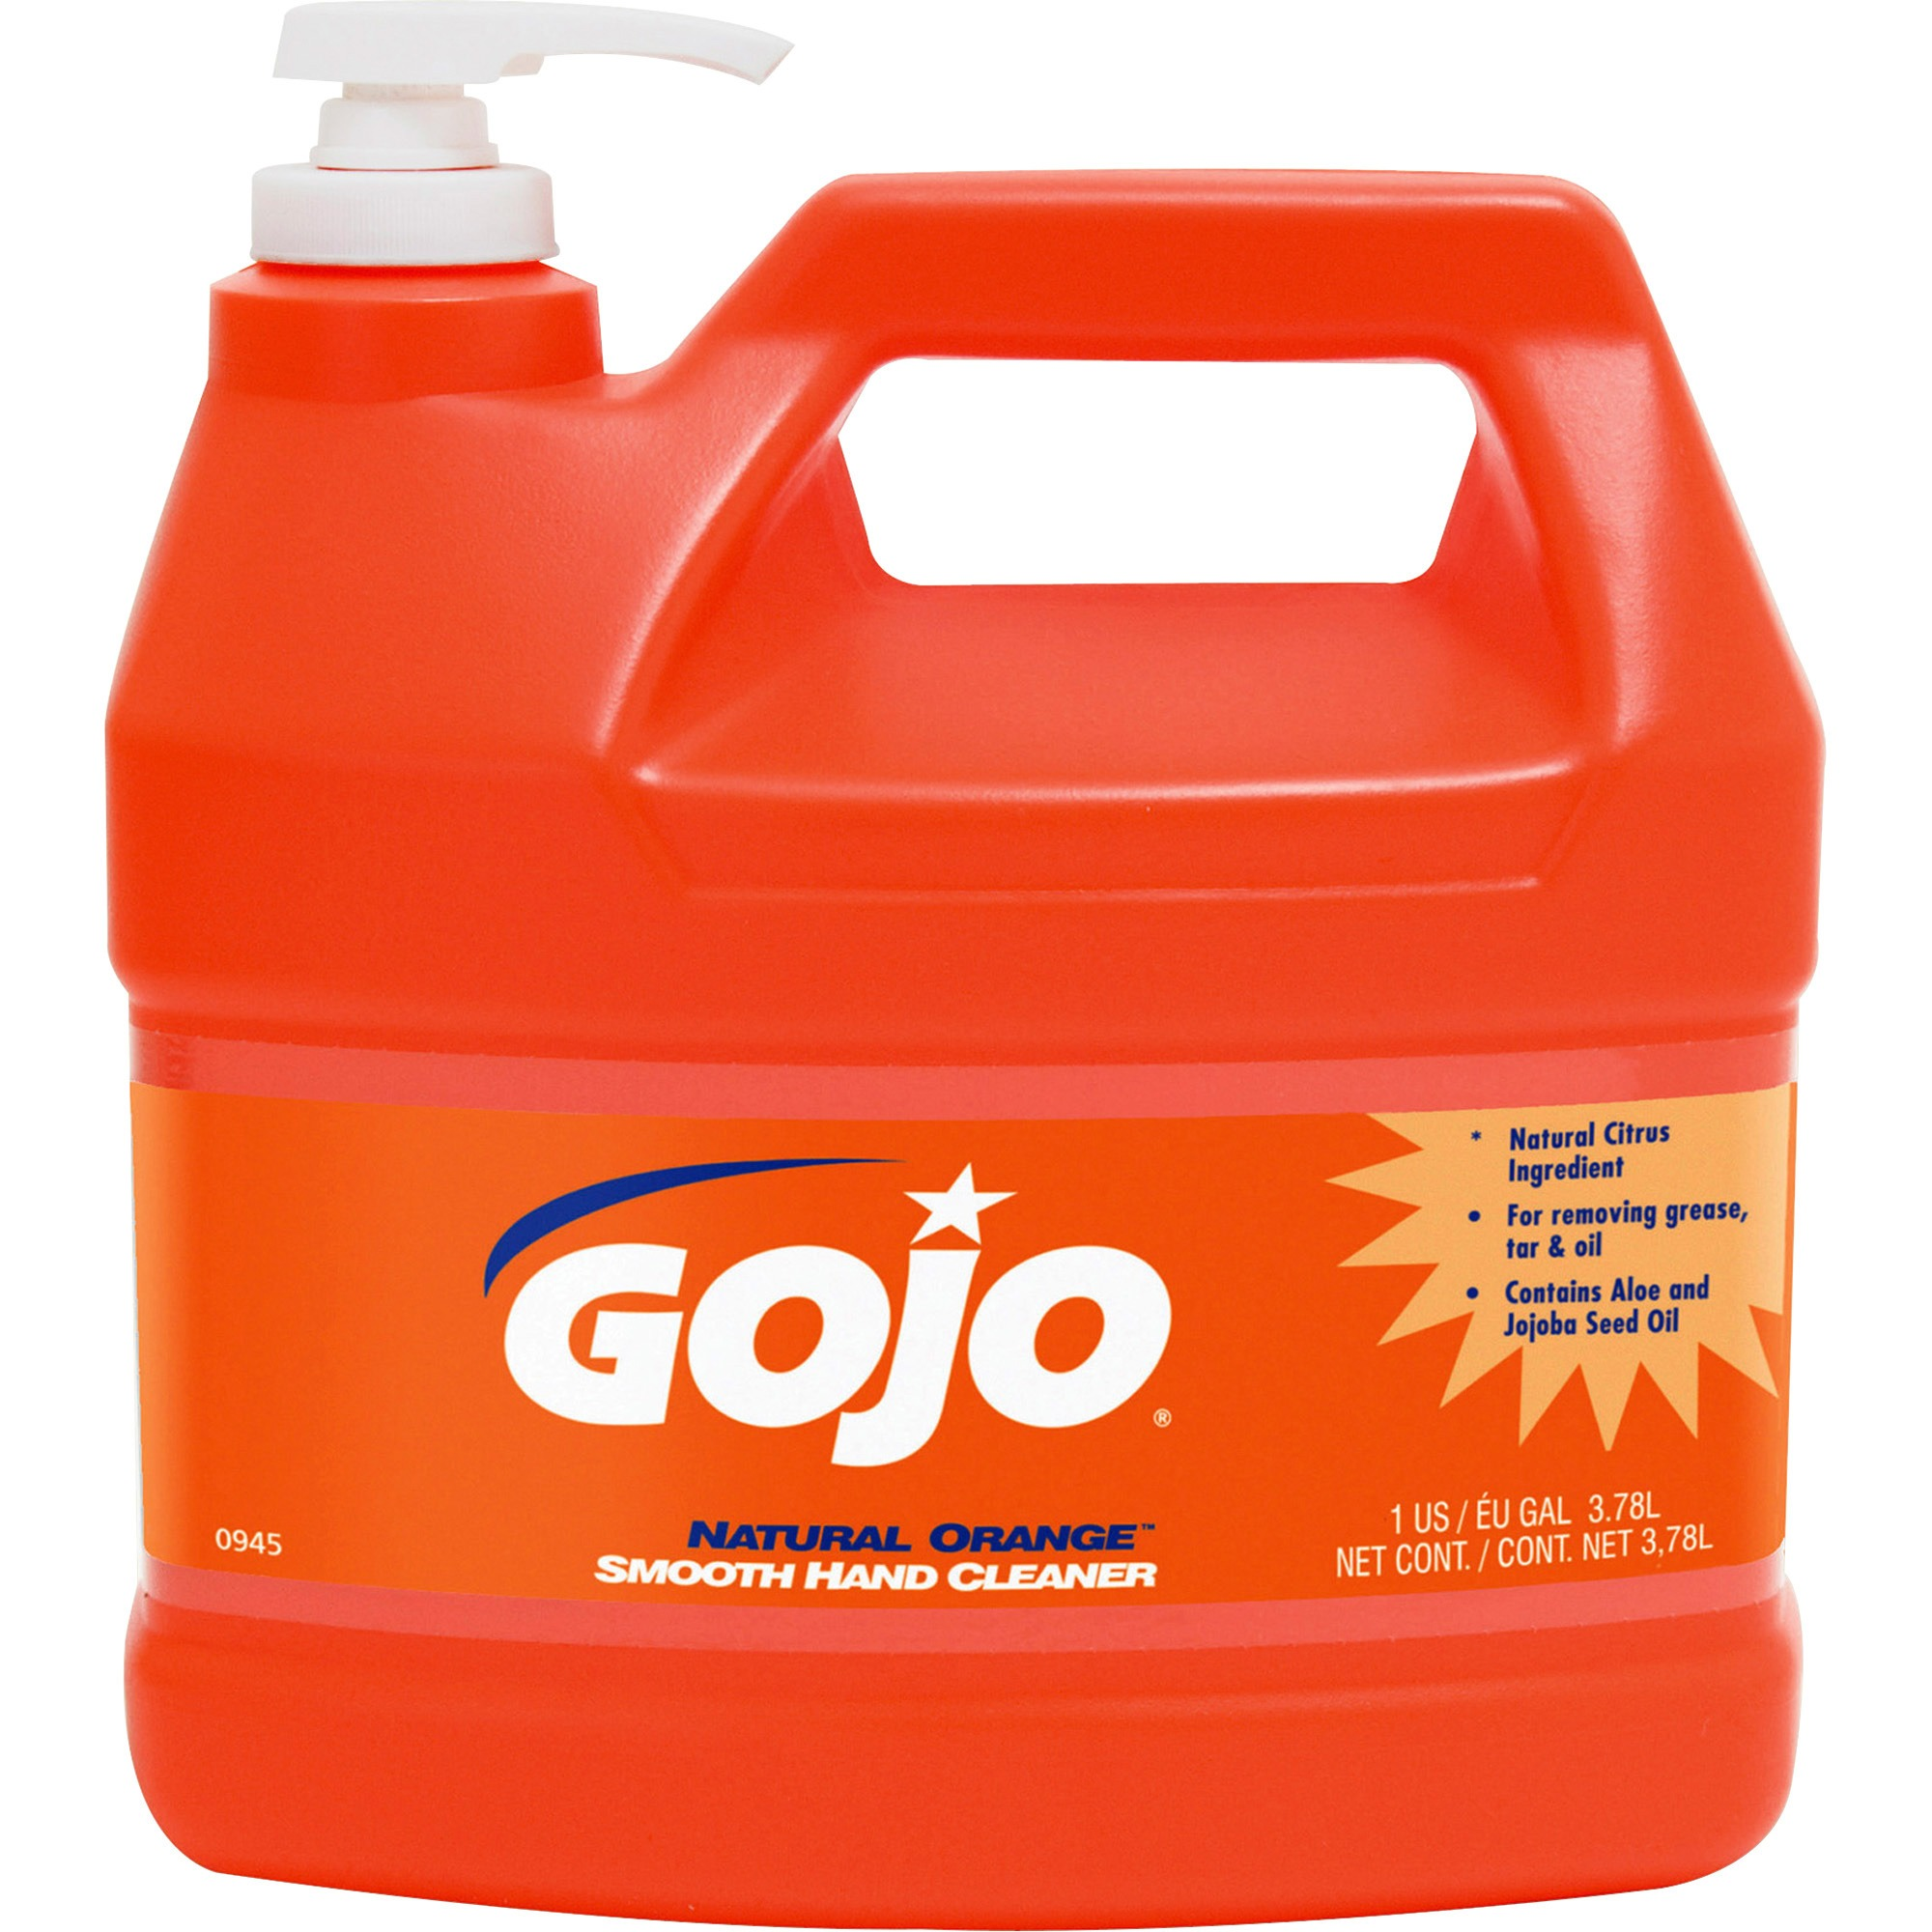 Gojo, GOJ094504CT, Natural Orange Smooth Hand Cleaner, 4 / Carton, Orange